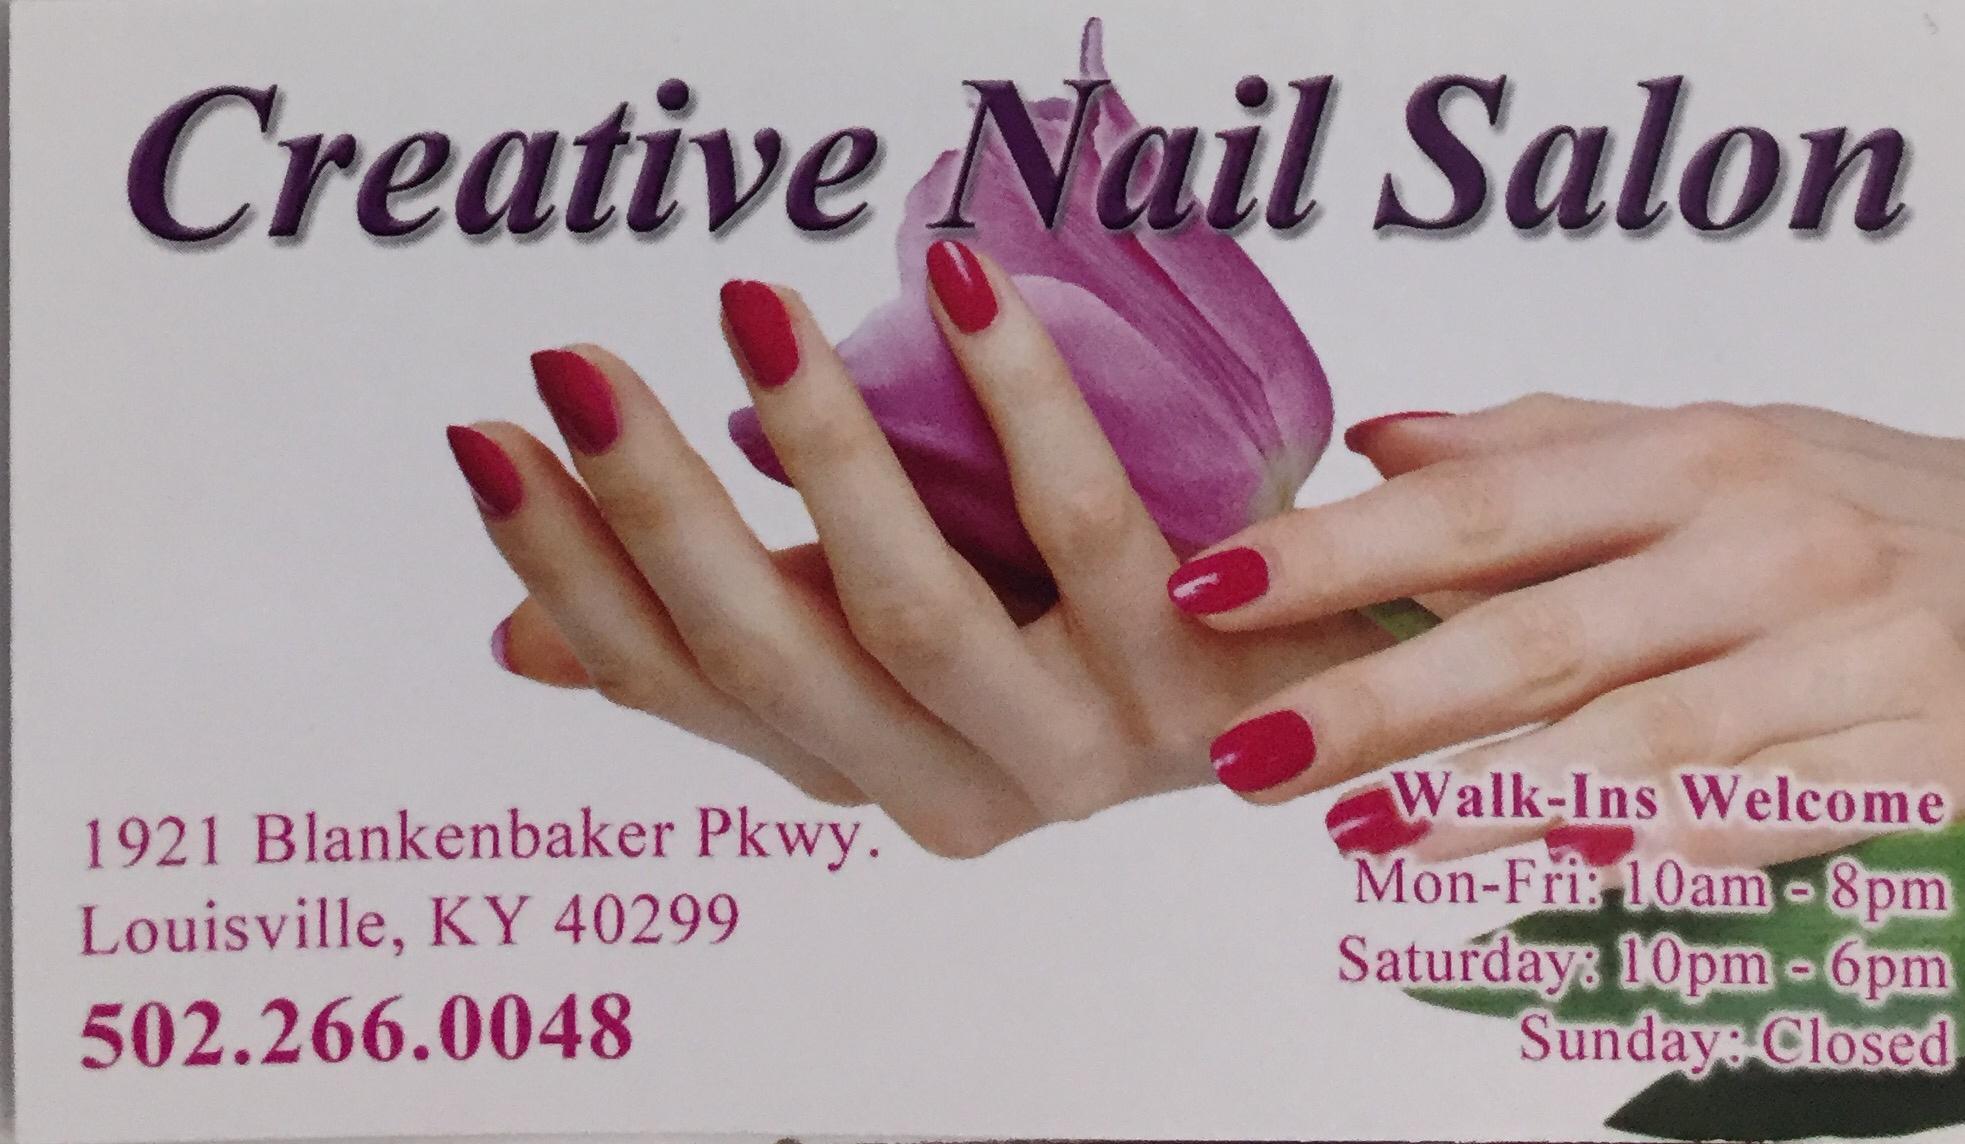 Creative Nail 1921 Blankenbaker Pkwy, Louisville, KY 40299 - YP.com